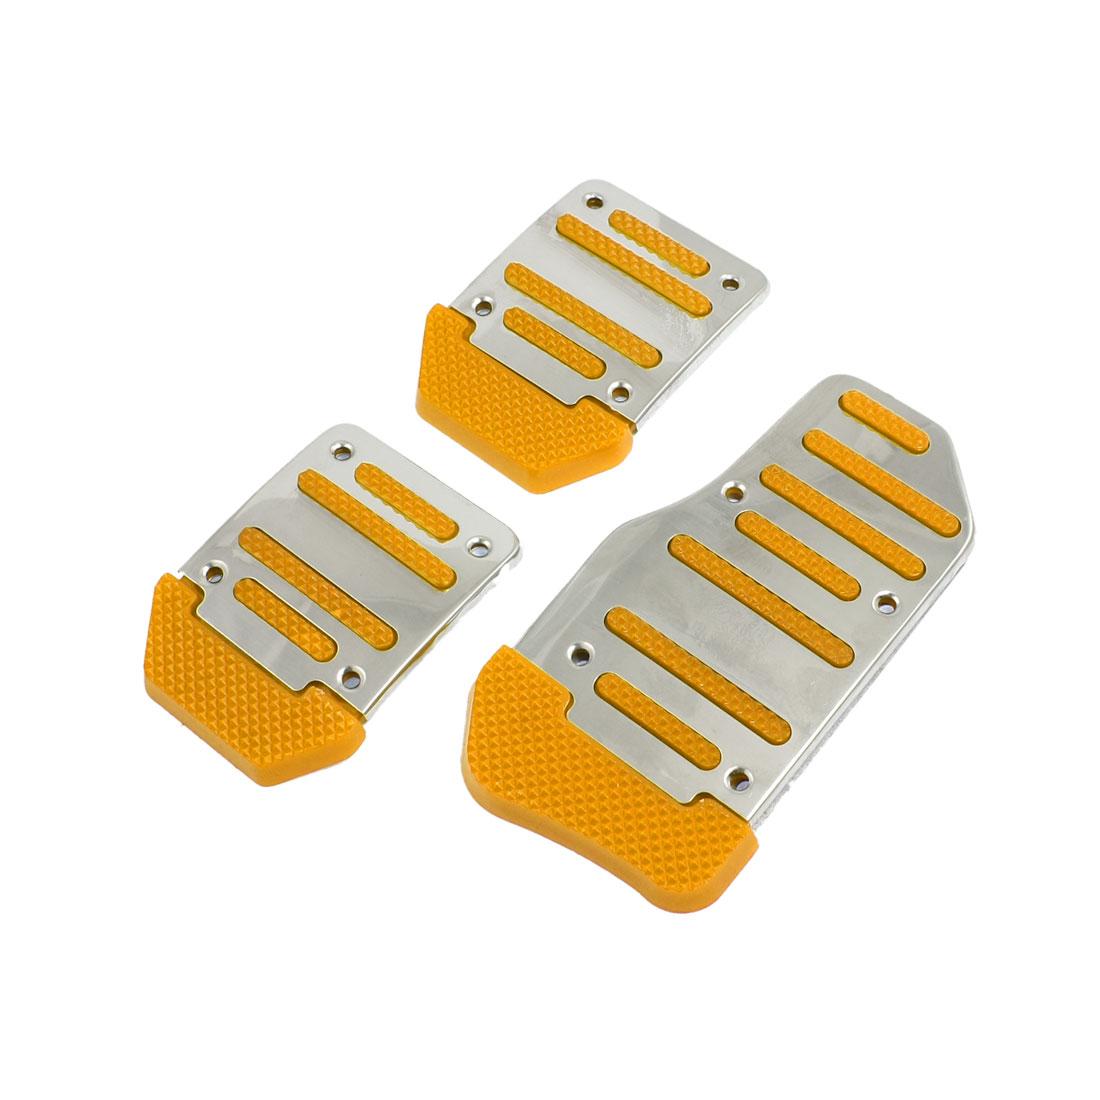 3 Pcs Silver Tone Orange Nonslip MT Car Gas Brake Pedal Cover